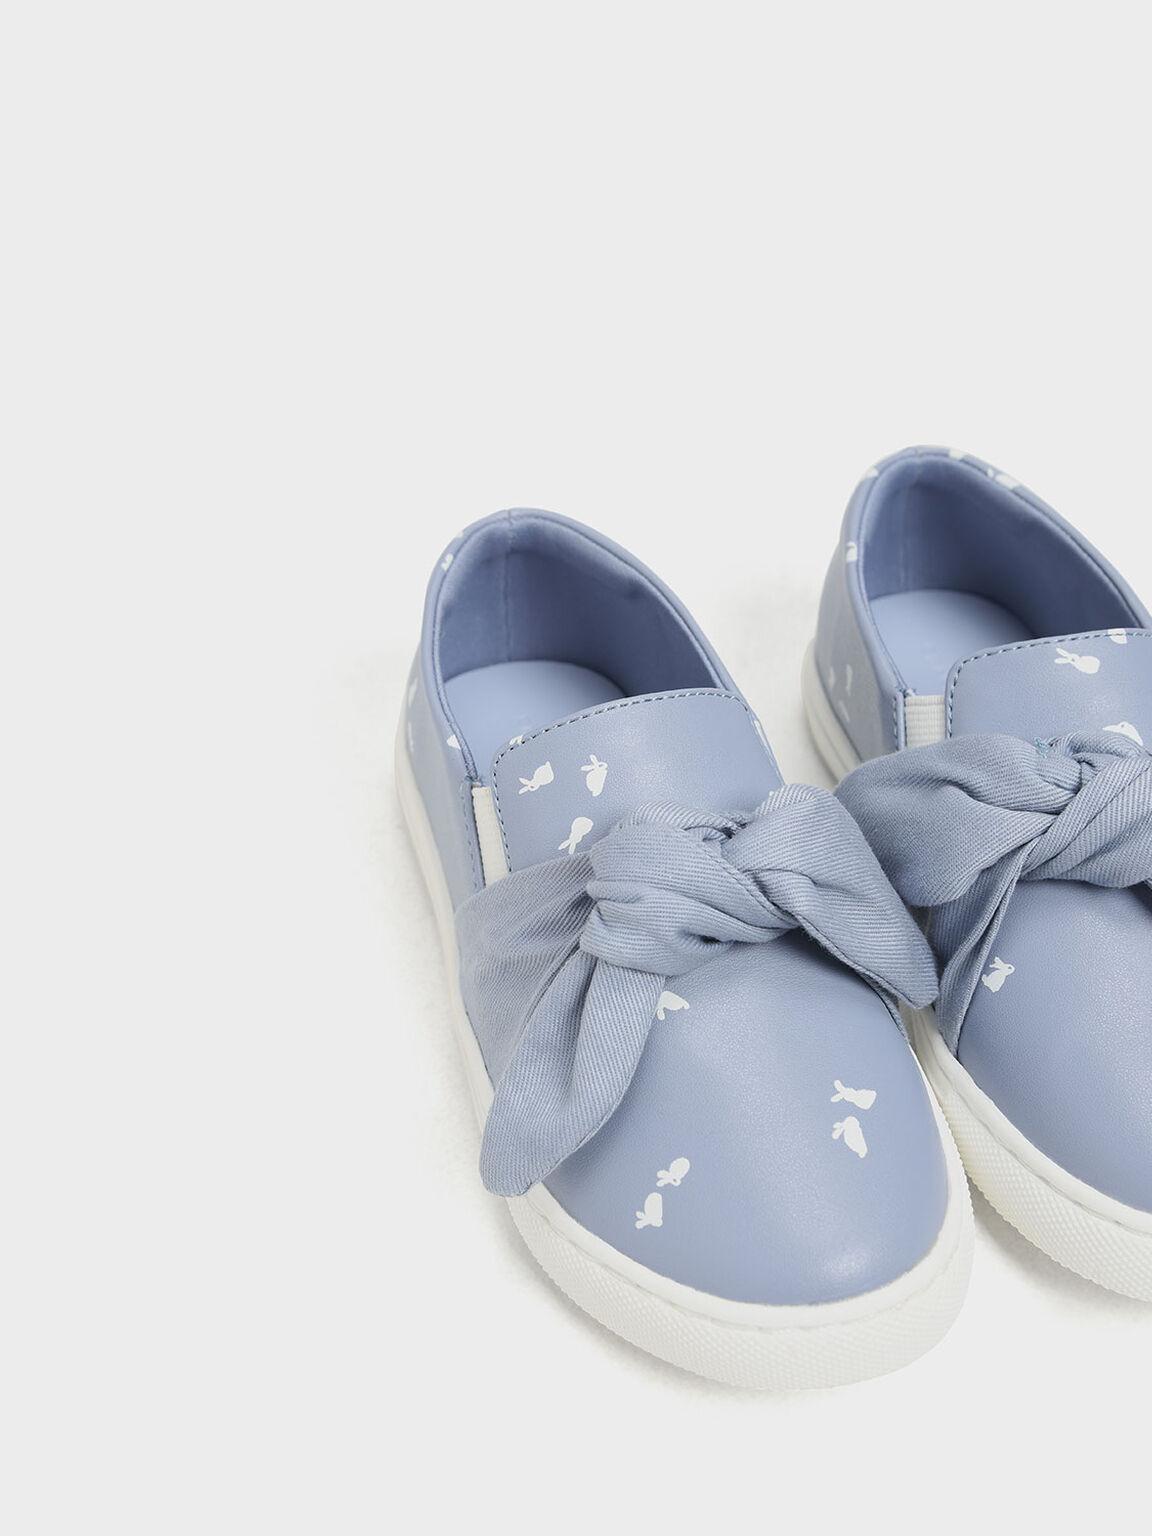 Kids' Bow Slip-On Sneakers, Light Blue, hi-res